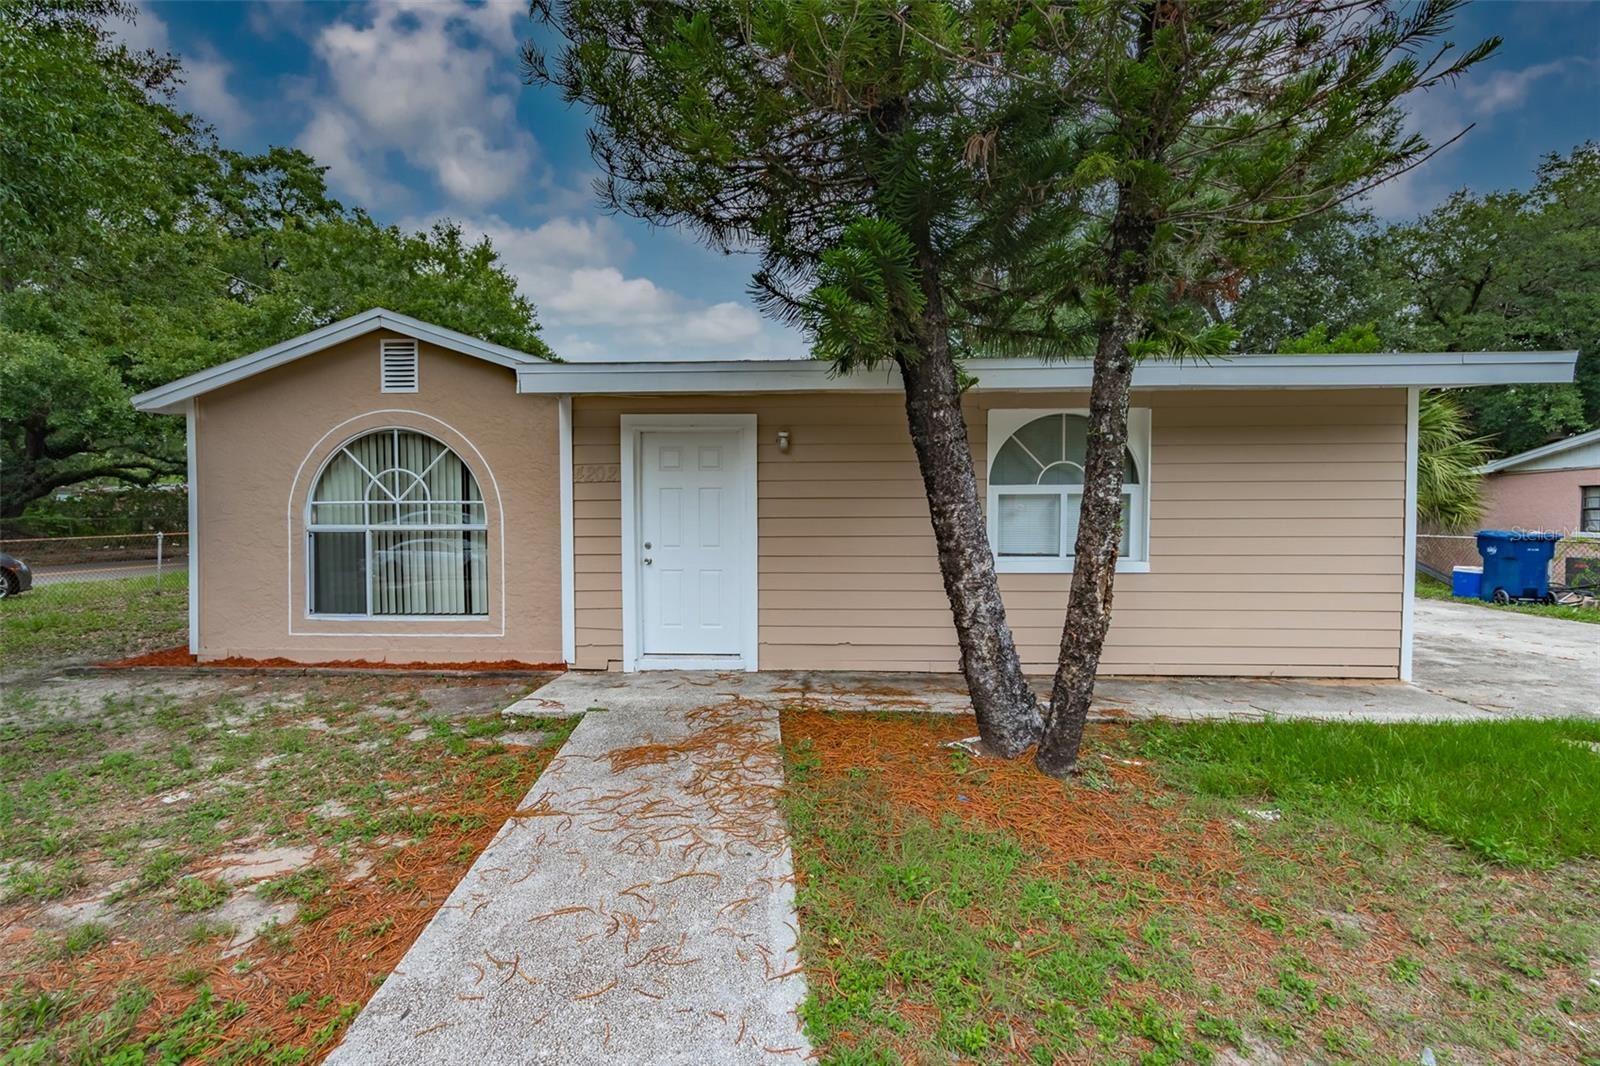 4202 E HENRY AVENUE, Tampa, FL 33610 - MLS#: T3313829